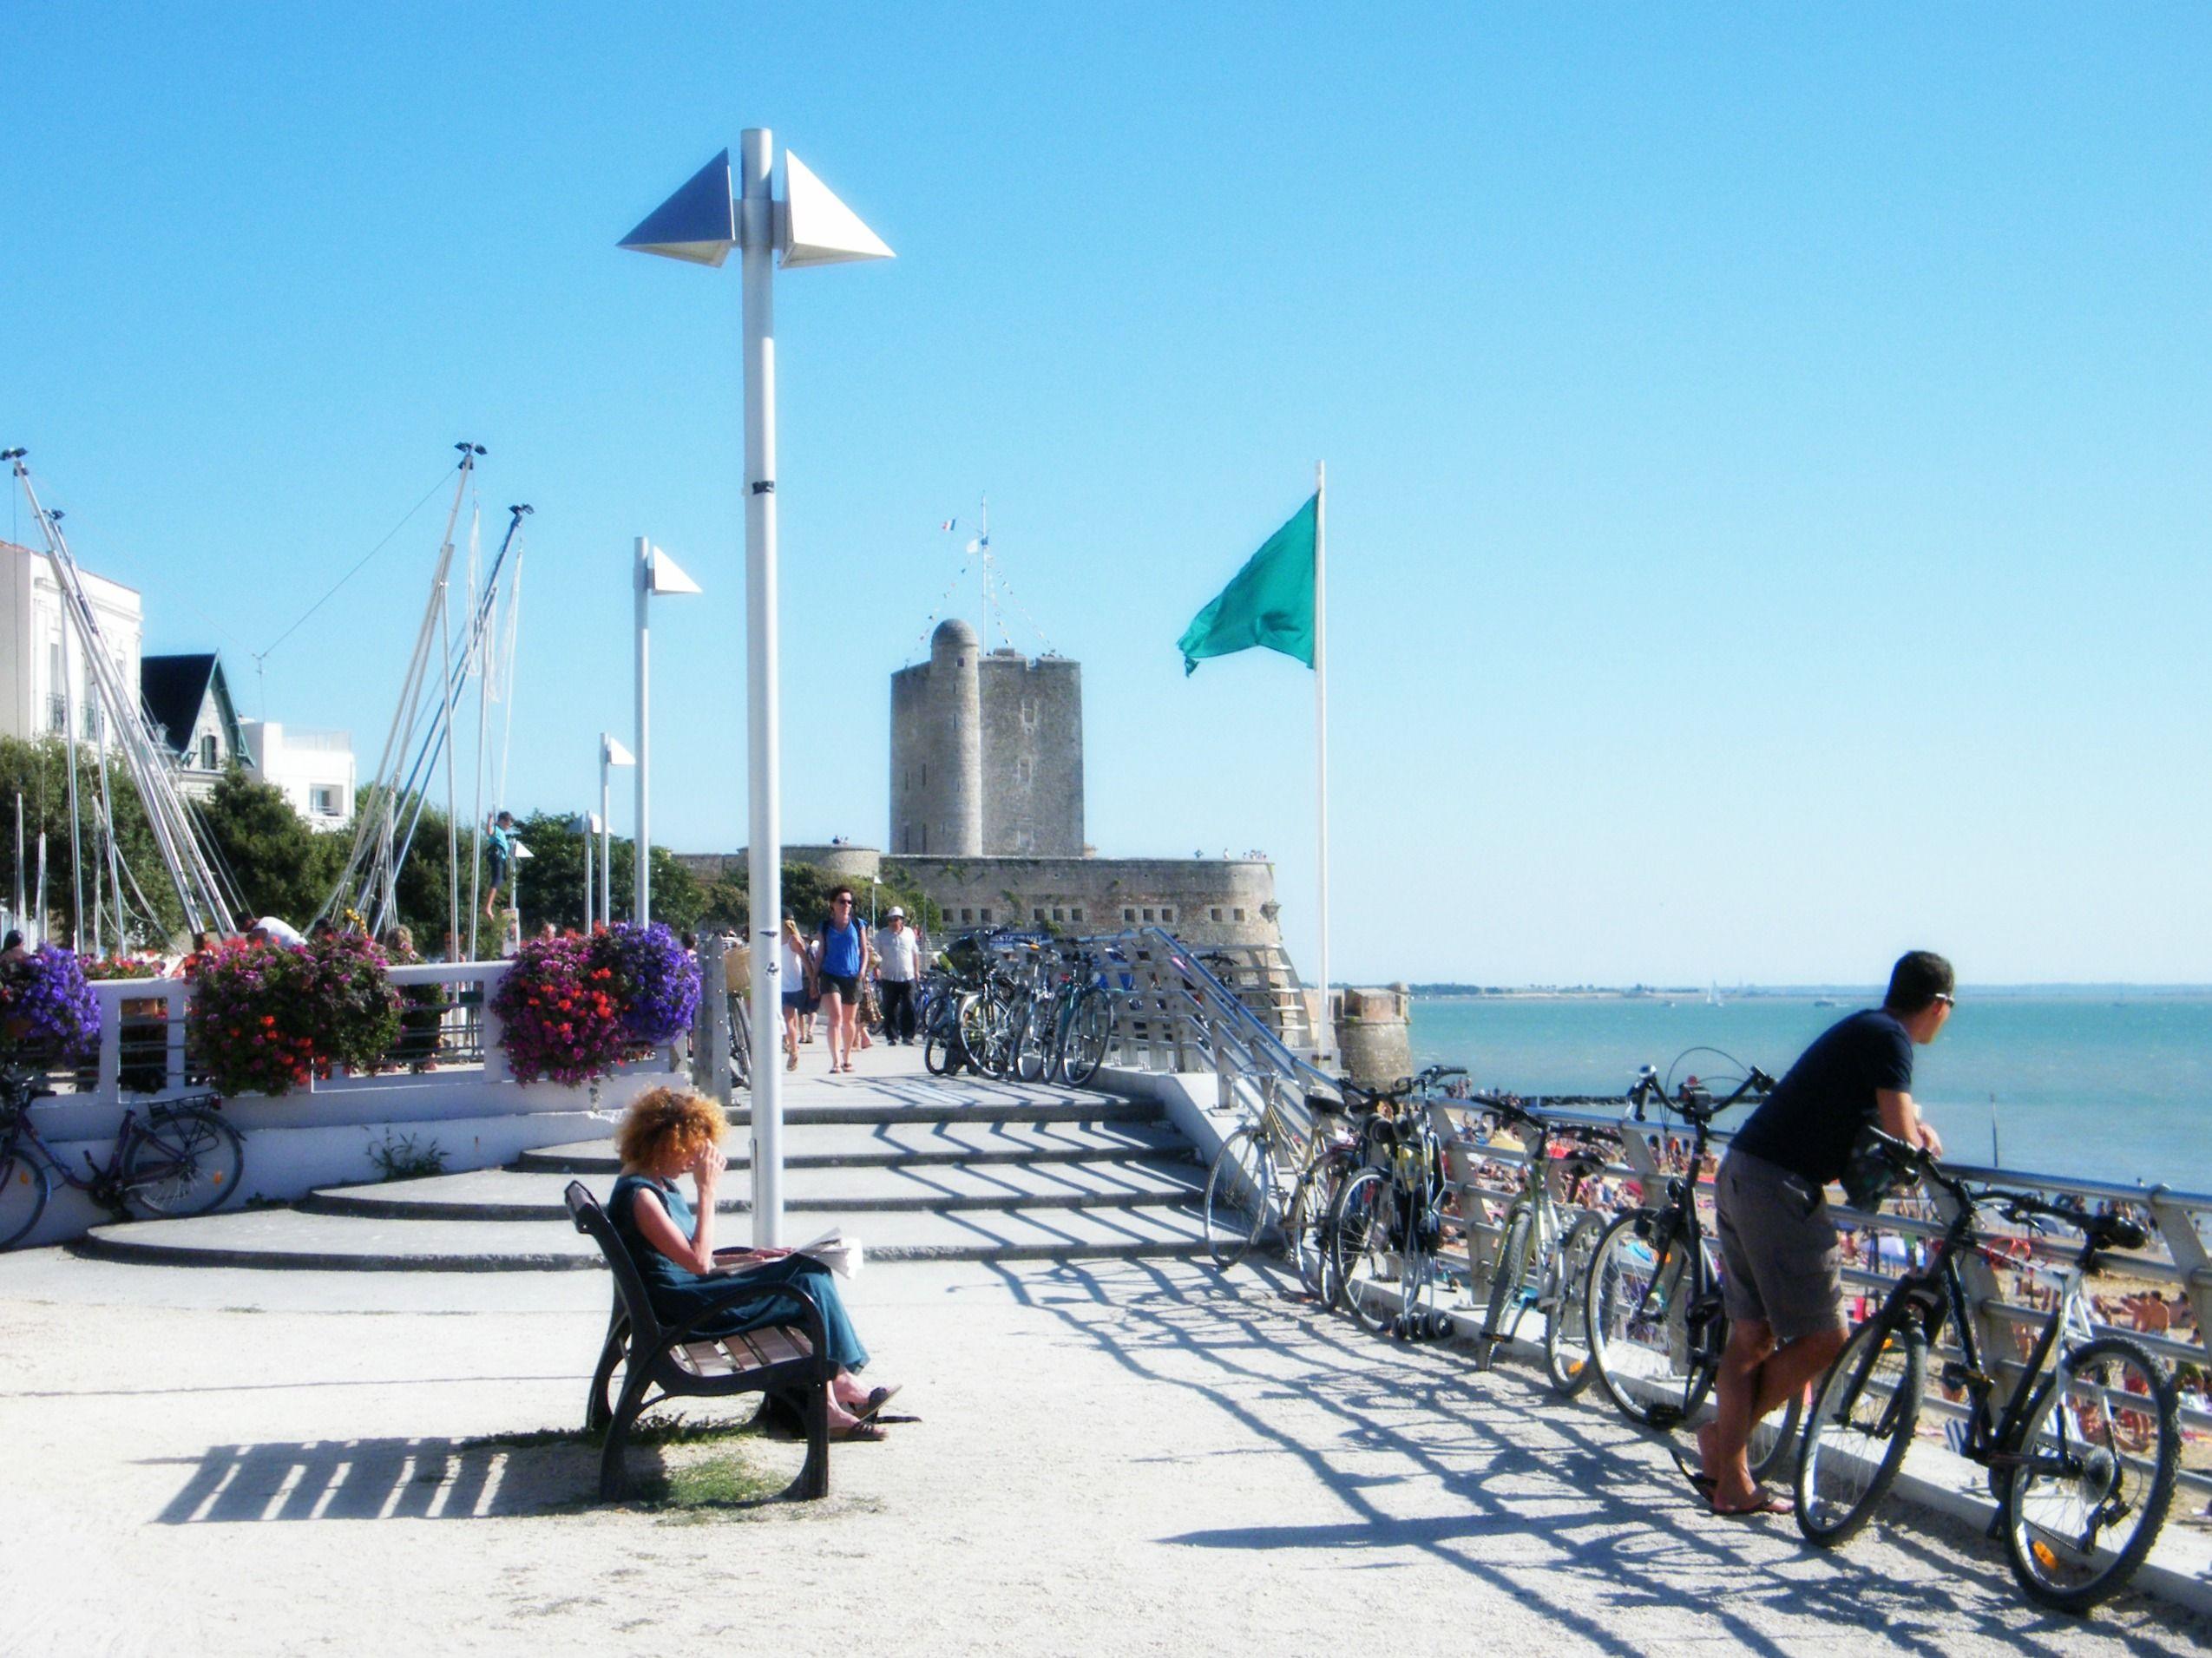 Promenade detente velo plage fouras ete vacances - Office du tourisme poitou charentes ...